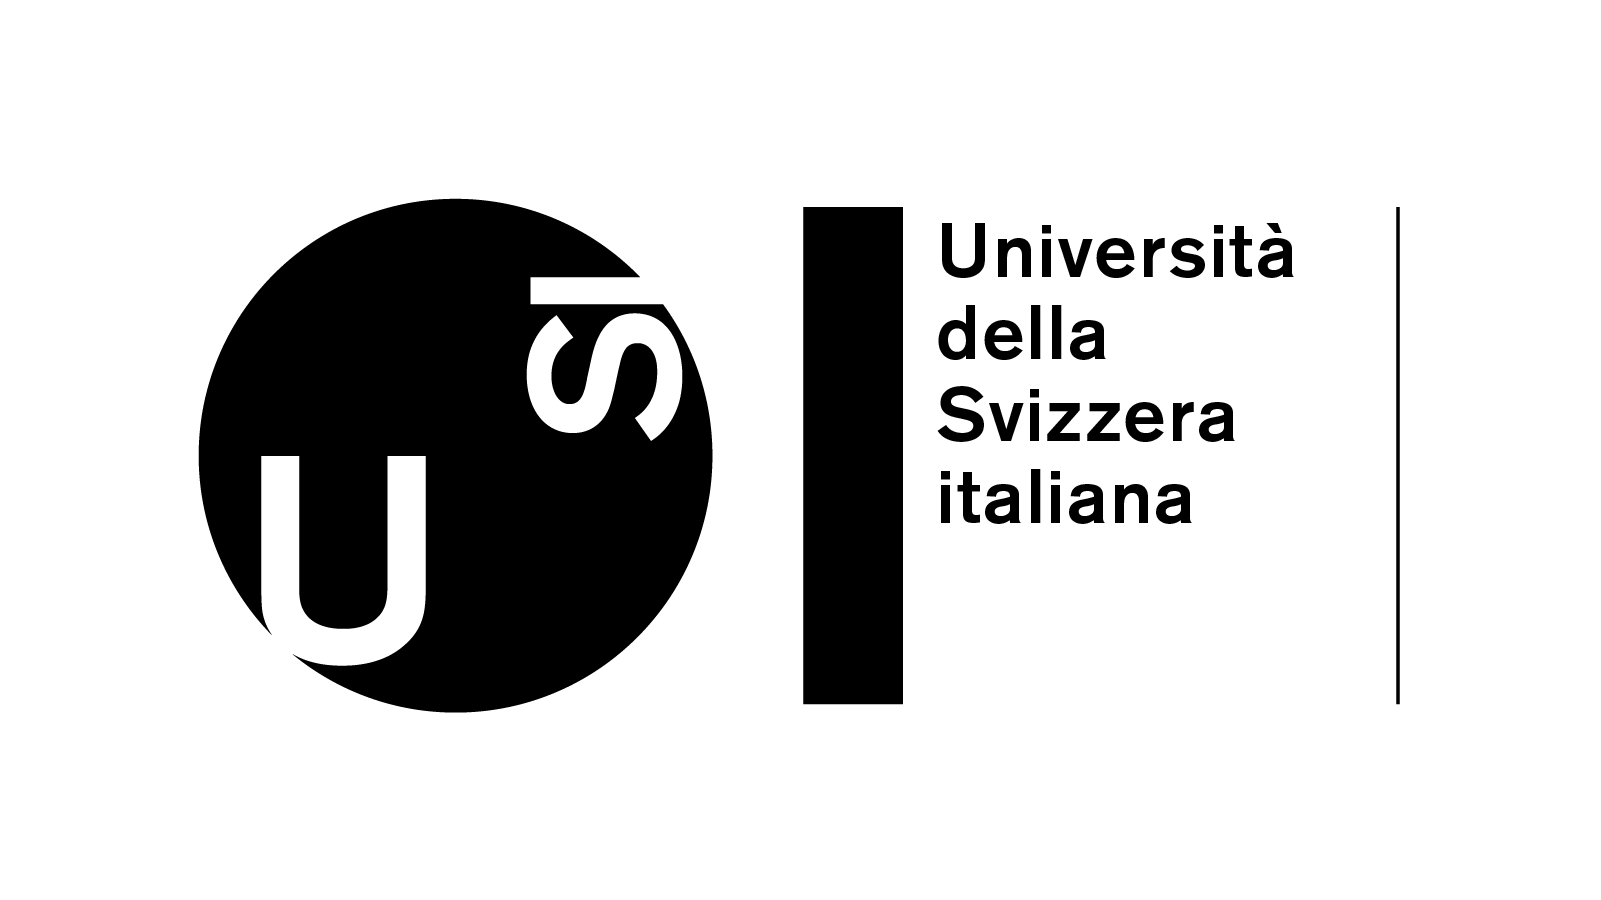 press-logo-statico-usi-orizzontale-web